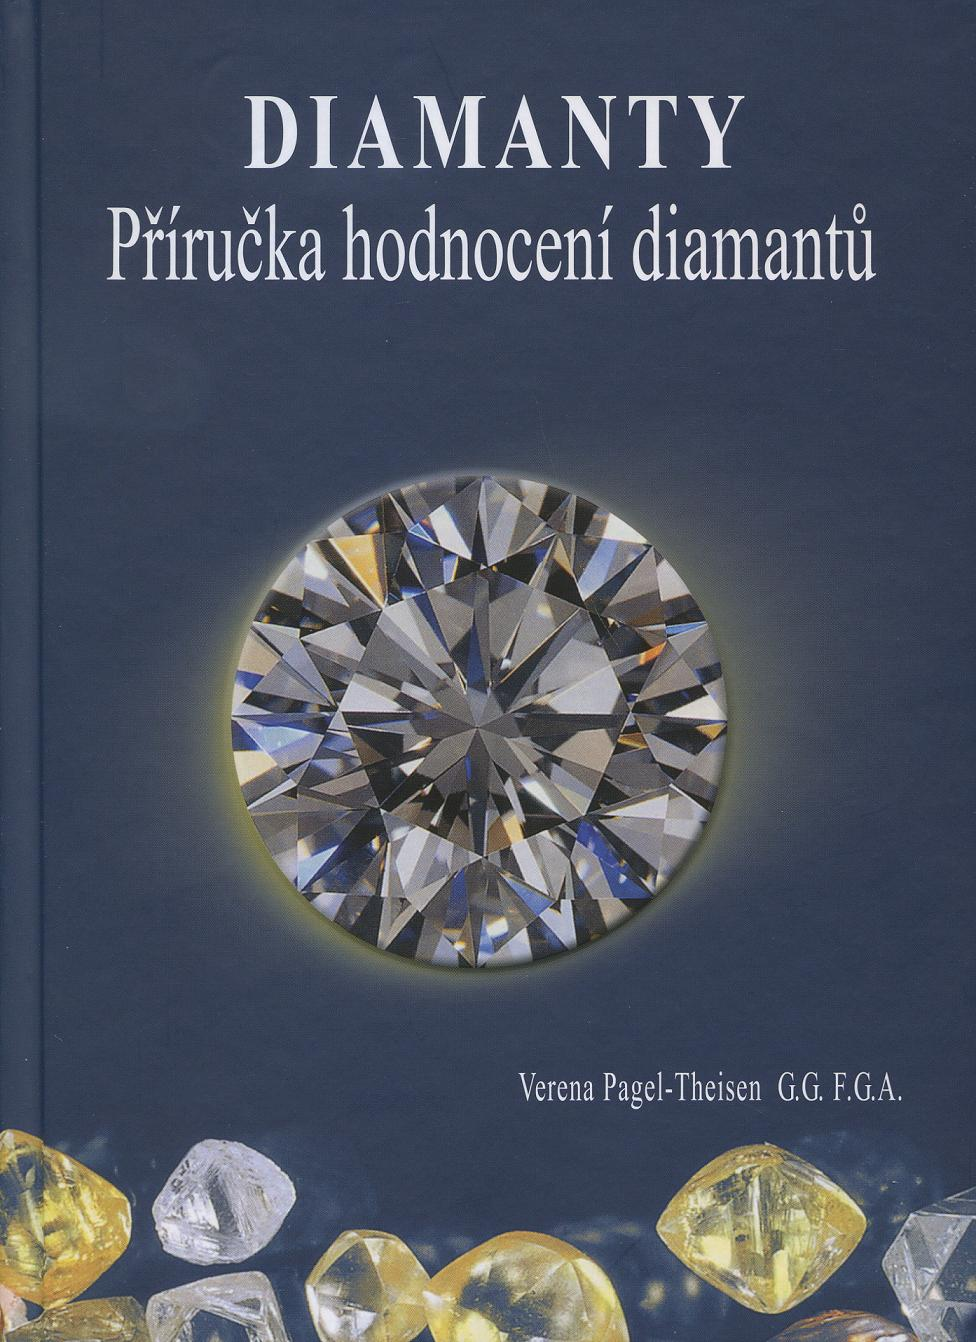 Diamanty - Příručka hodnocení diamantů - 2. upravené vydanie